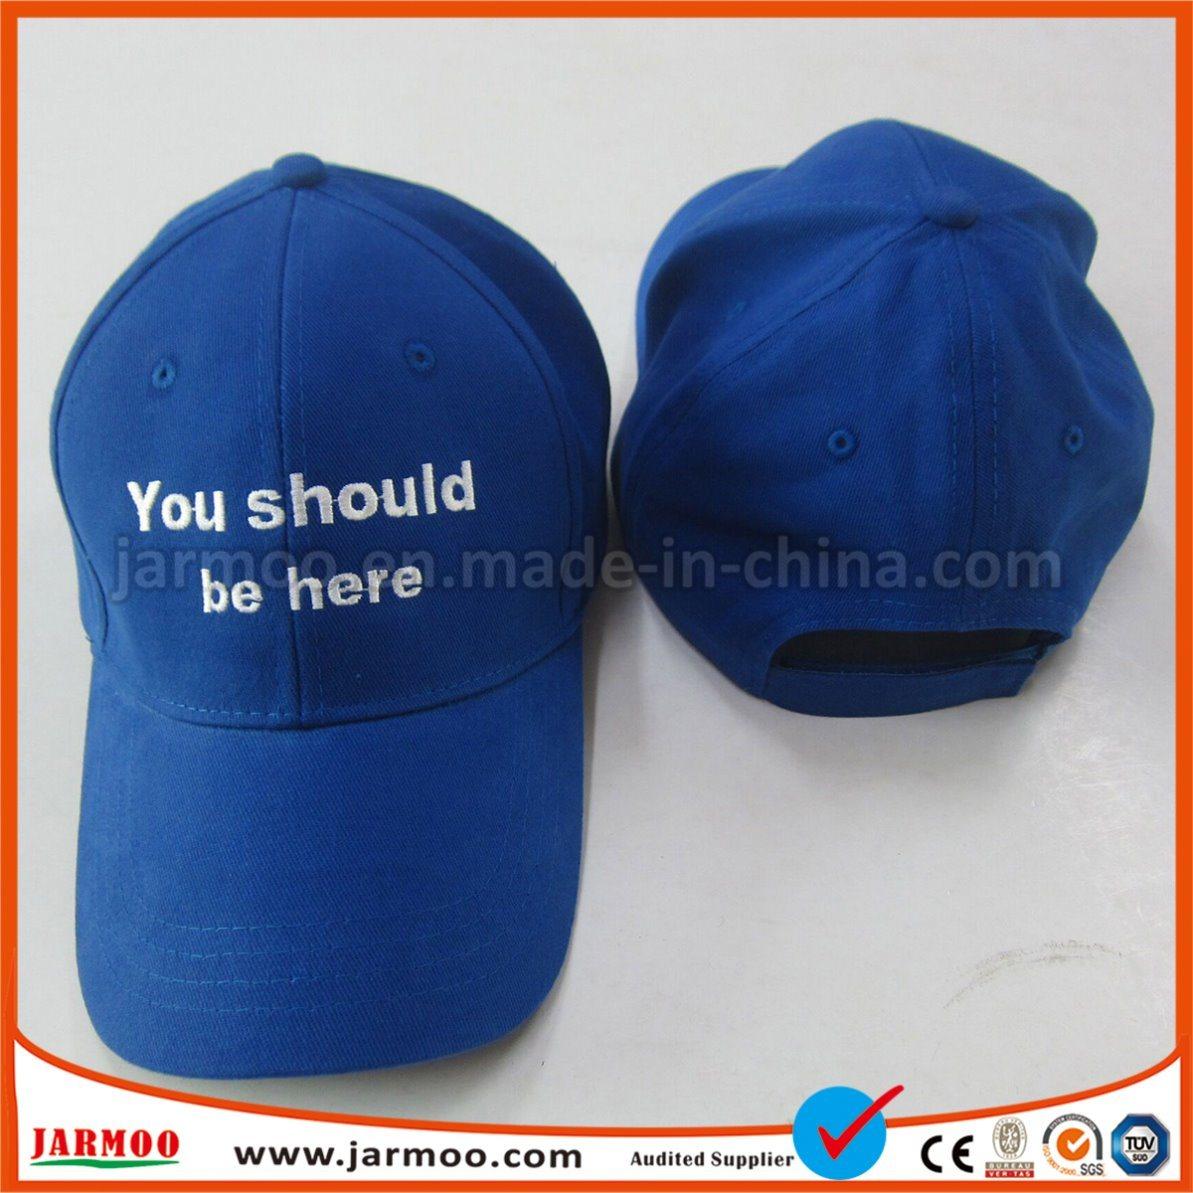 China Brim Custom Baseball Cap, Brim Custom Baseball Cap Wholesale,  Manufacturers, Price | Made-in-China com